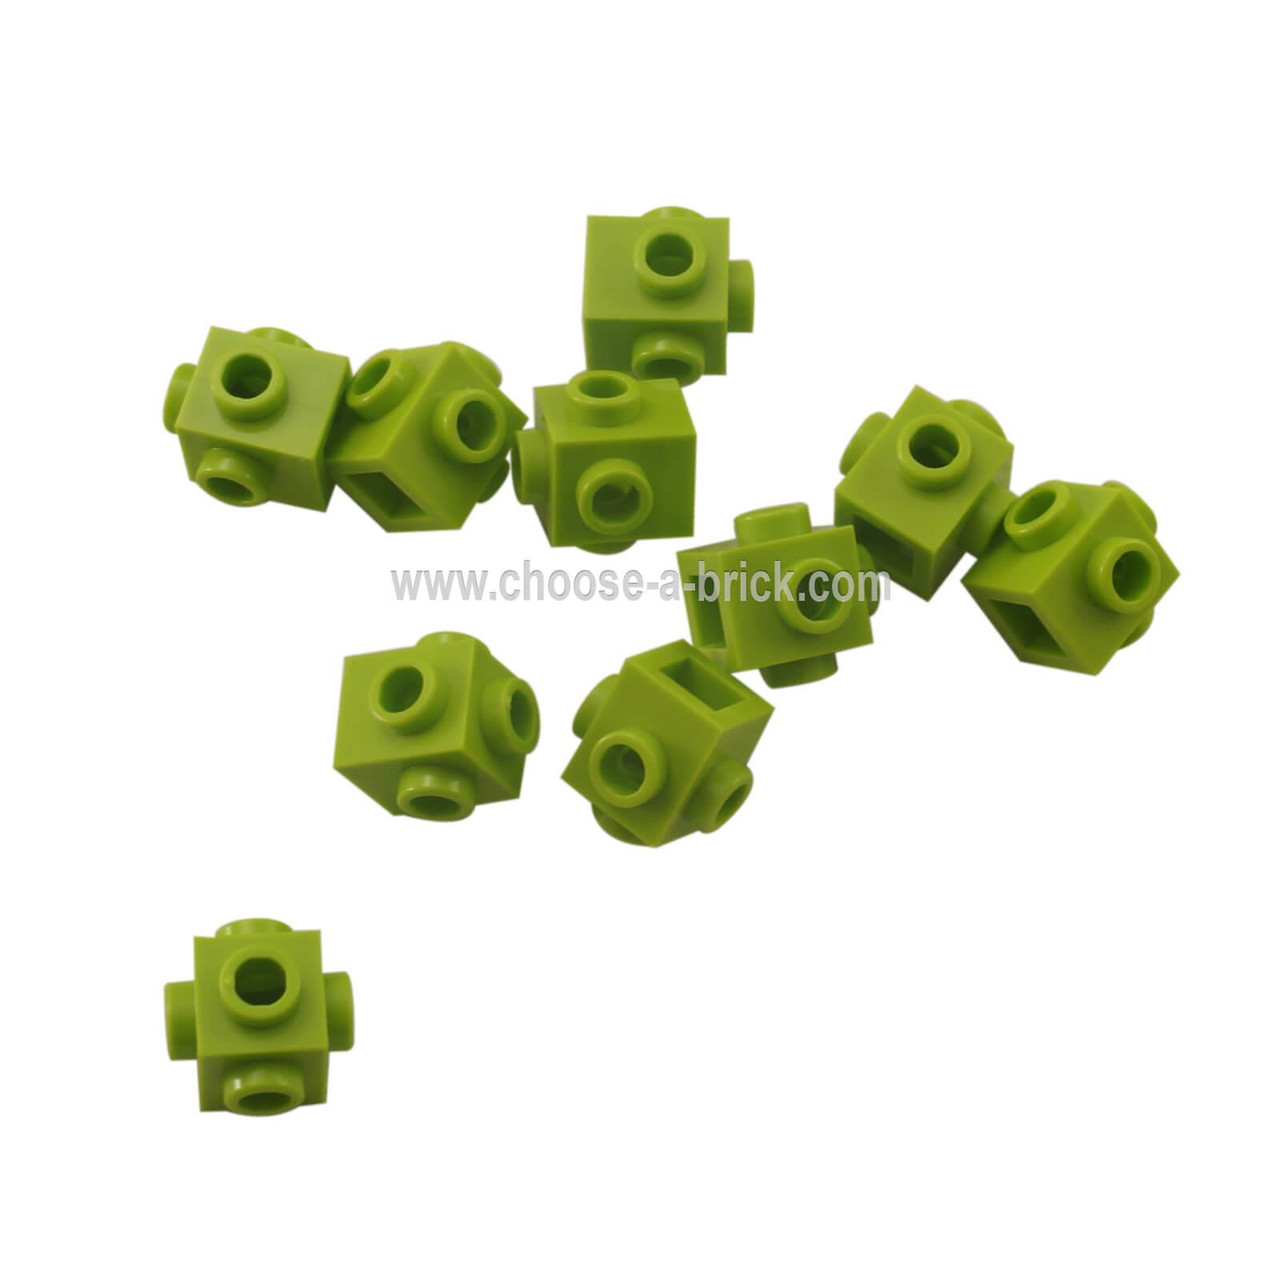 Black Brick 1 x 1 w Studs on 4 Sides No 4733 LEGO Parts QTY 15